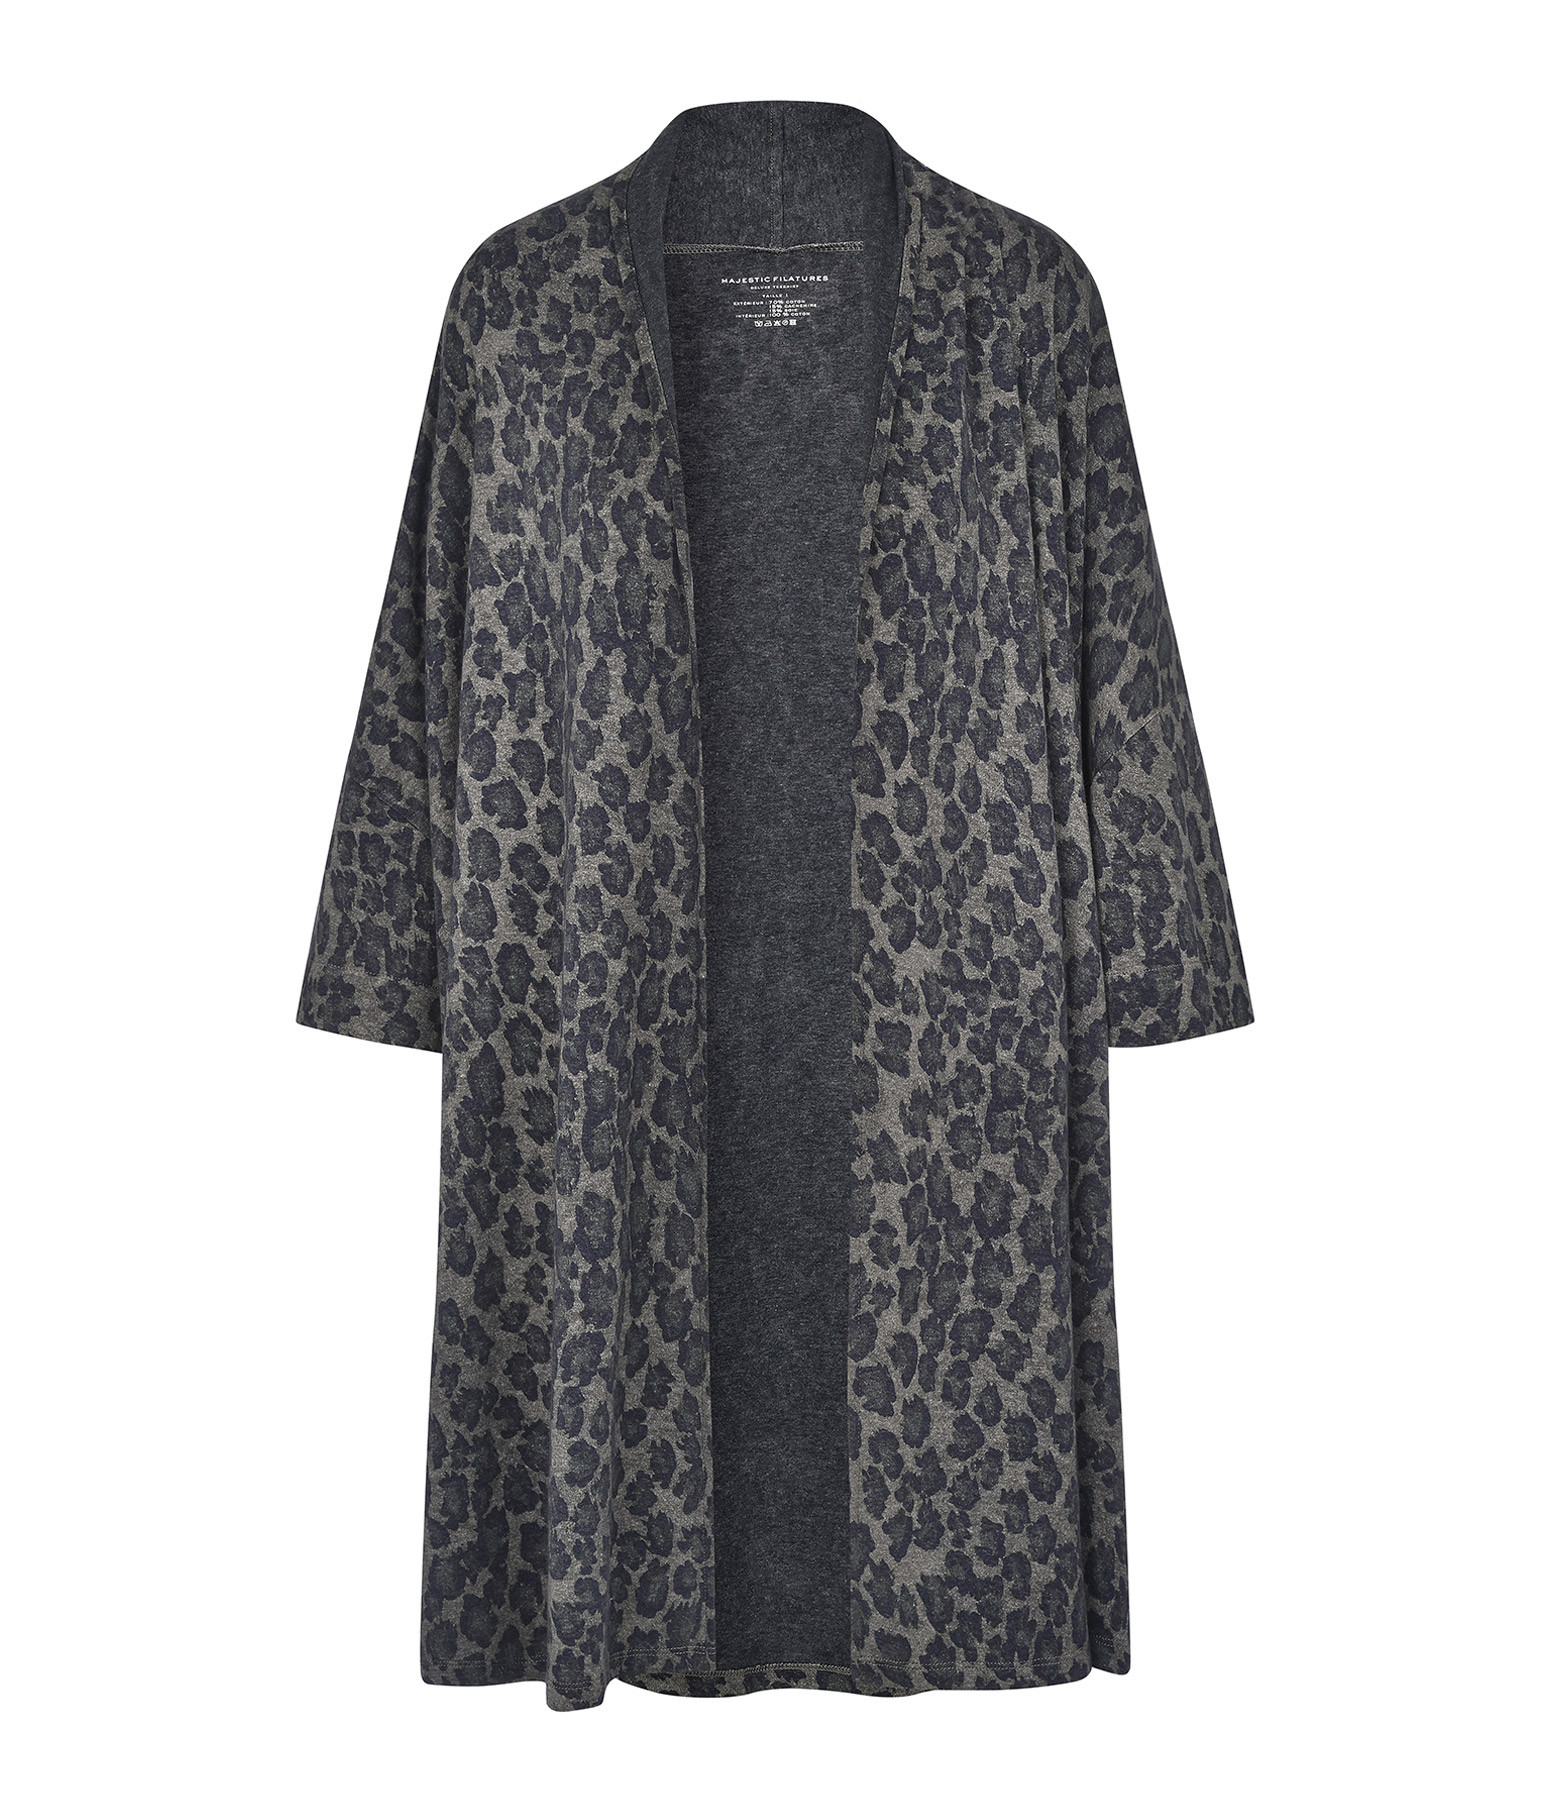 MAJESTIC FILATURES - Kimono Coton Soie Imprimé Kaki